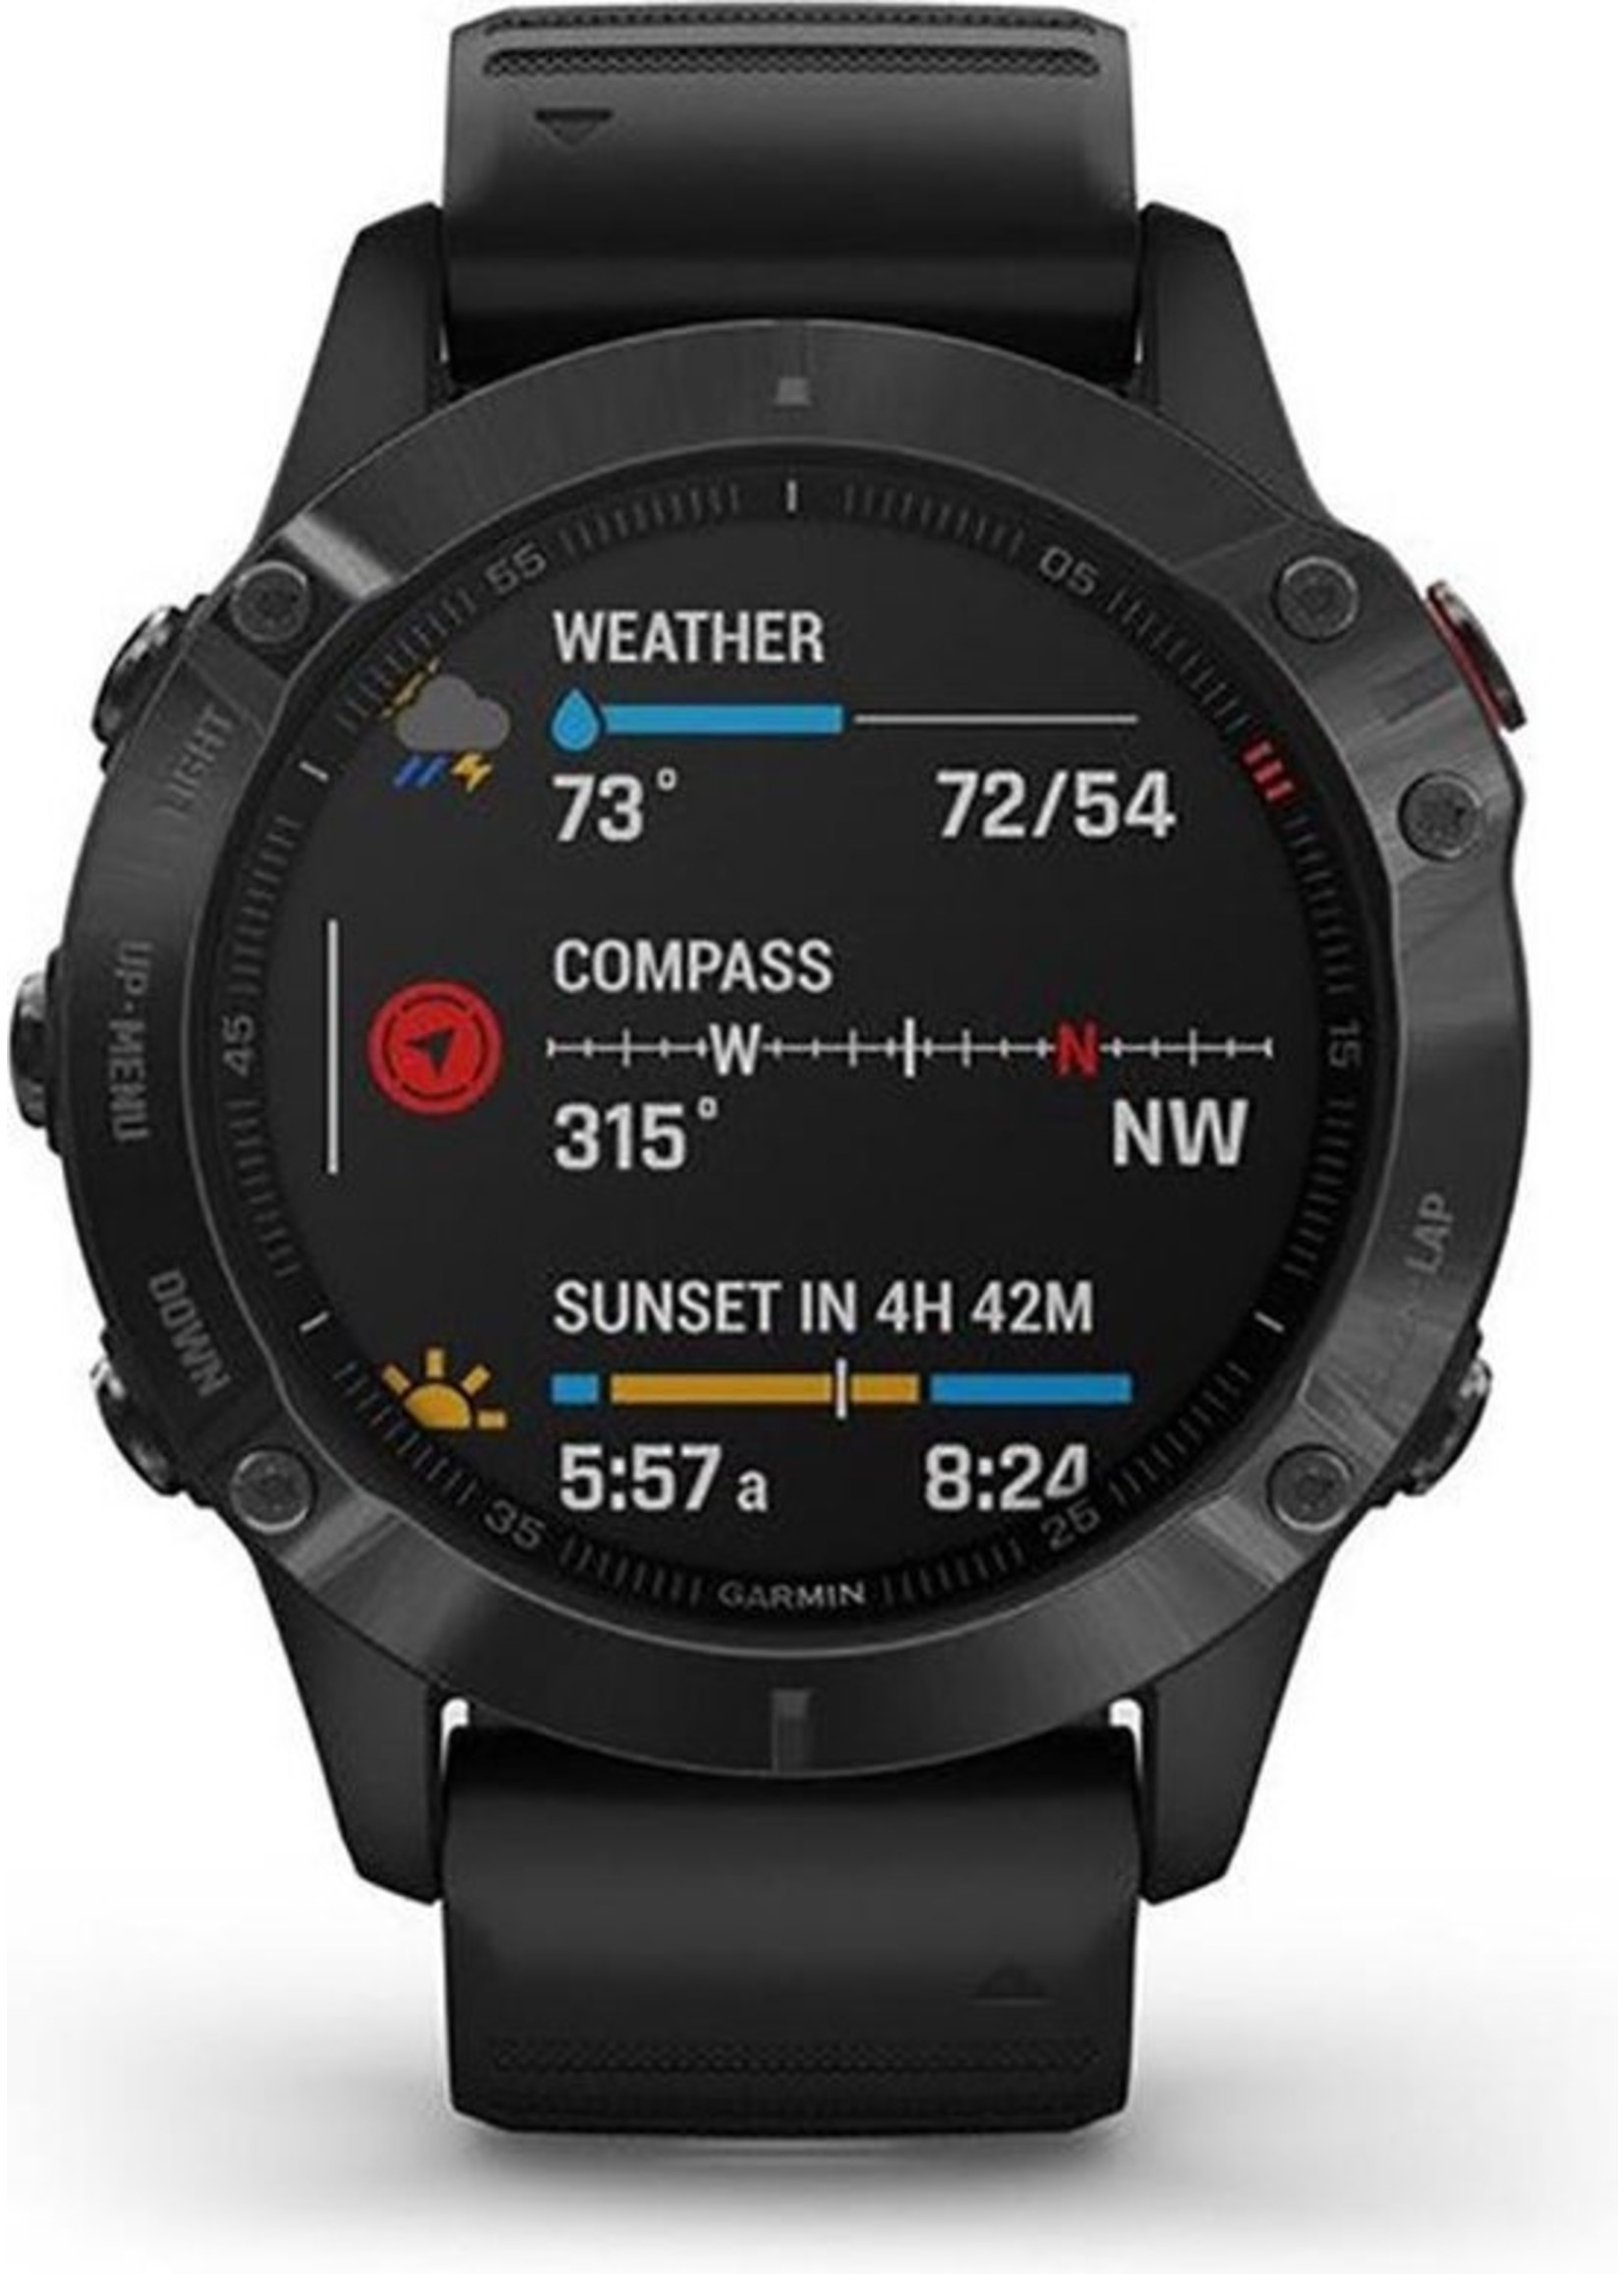 Garmin Garmin Fenix 6 PRO - Multisport - Smartwatch - Black